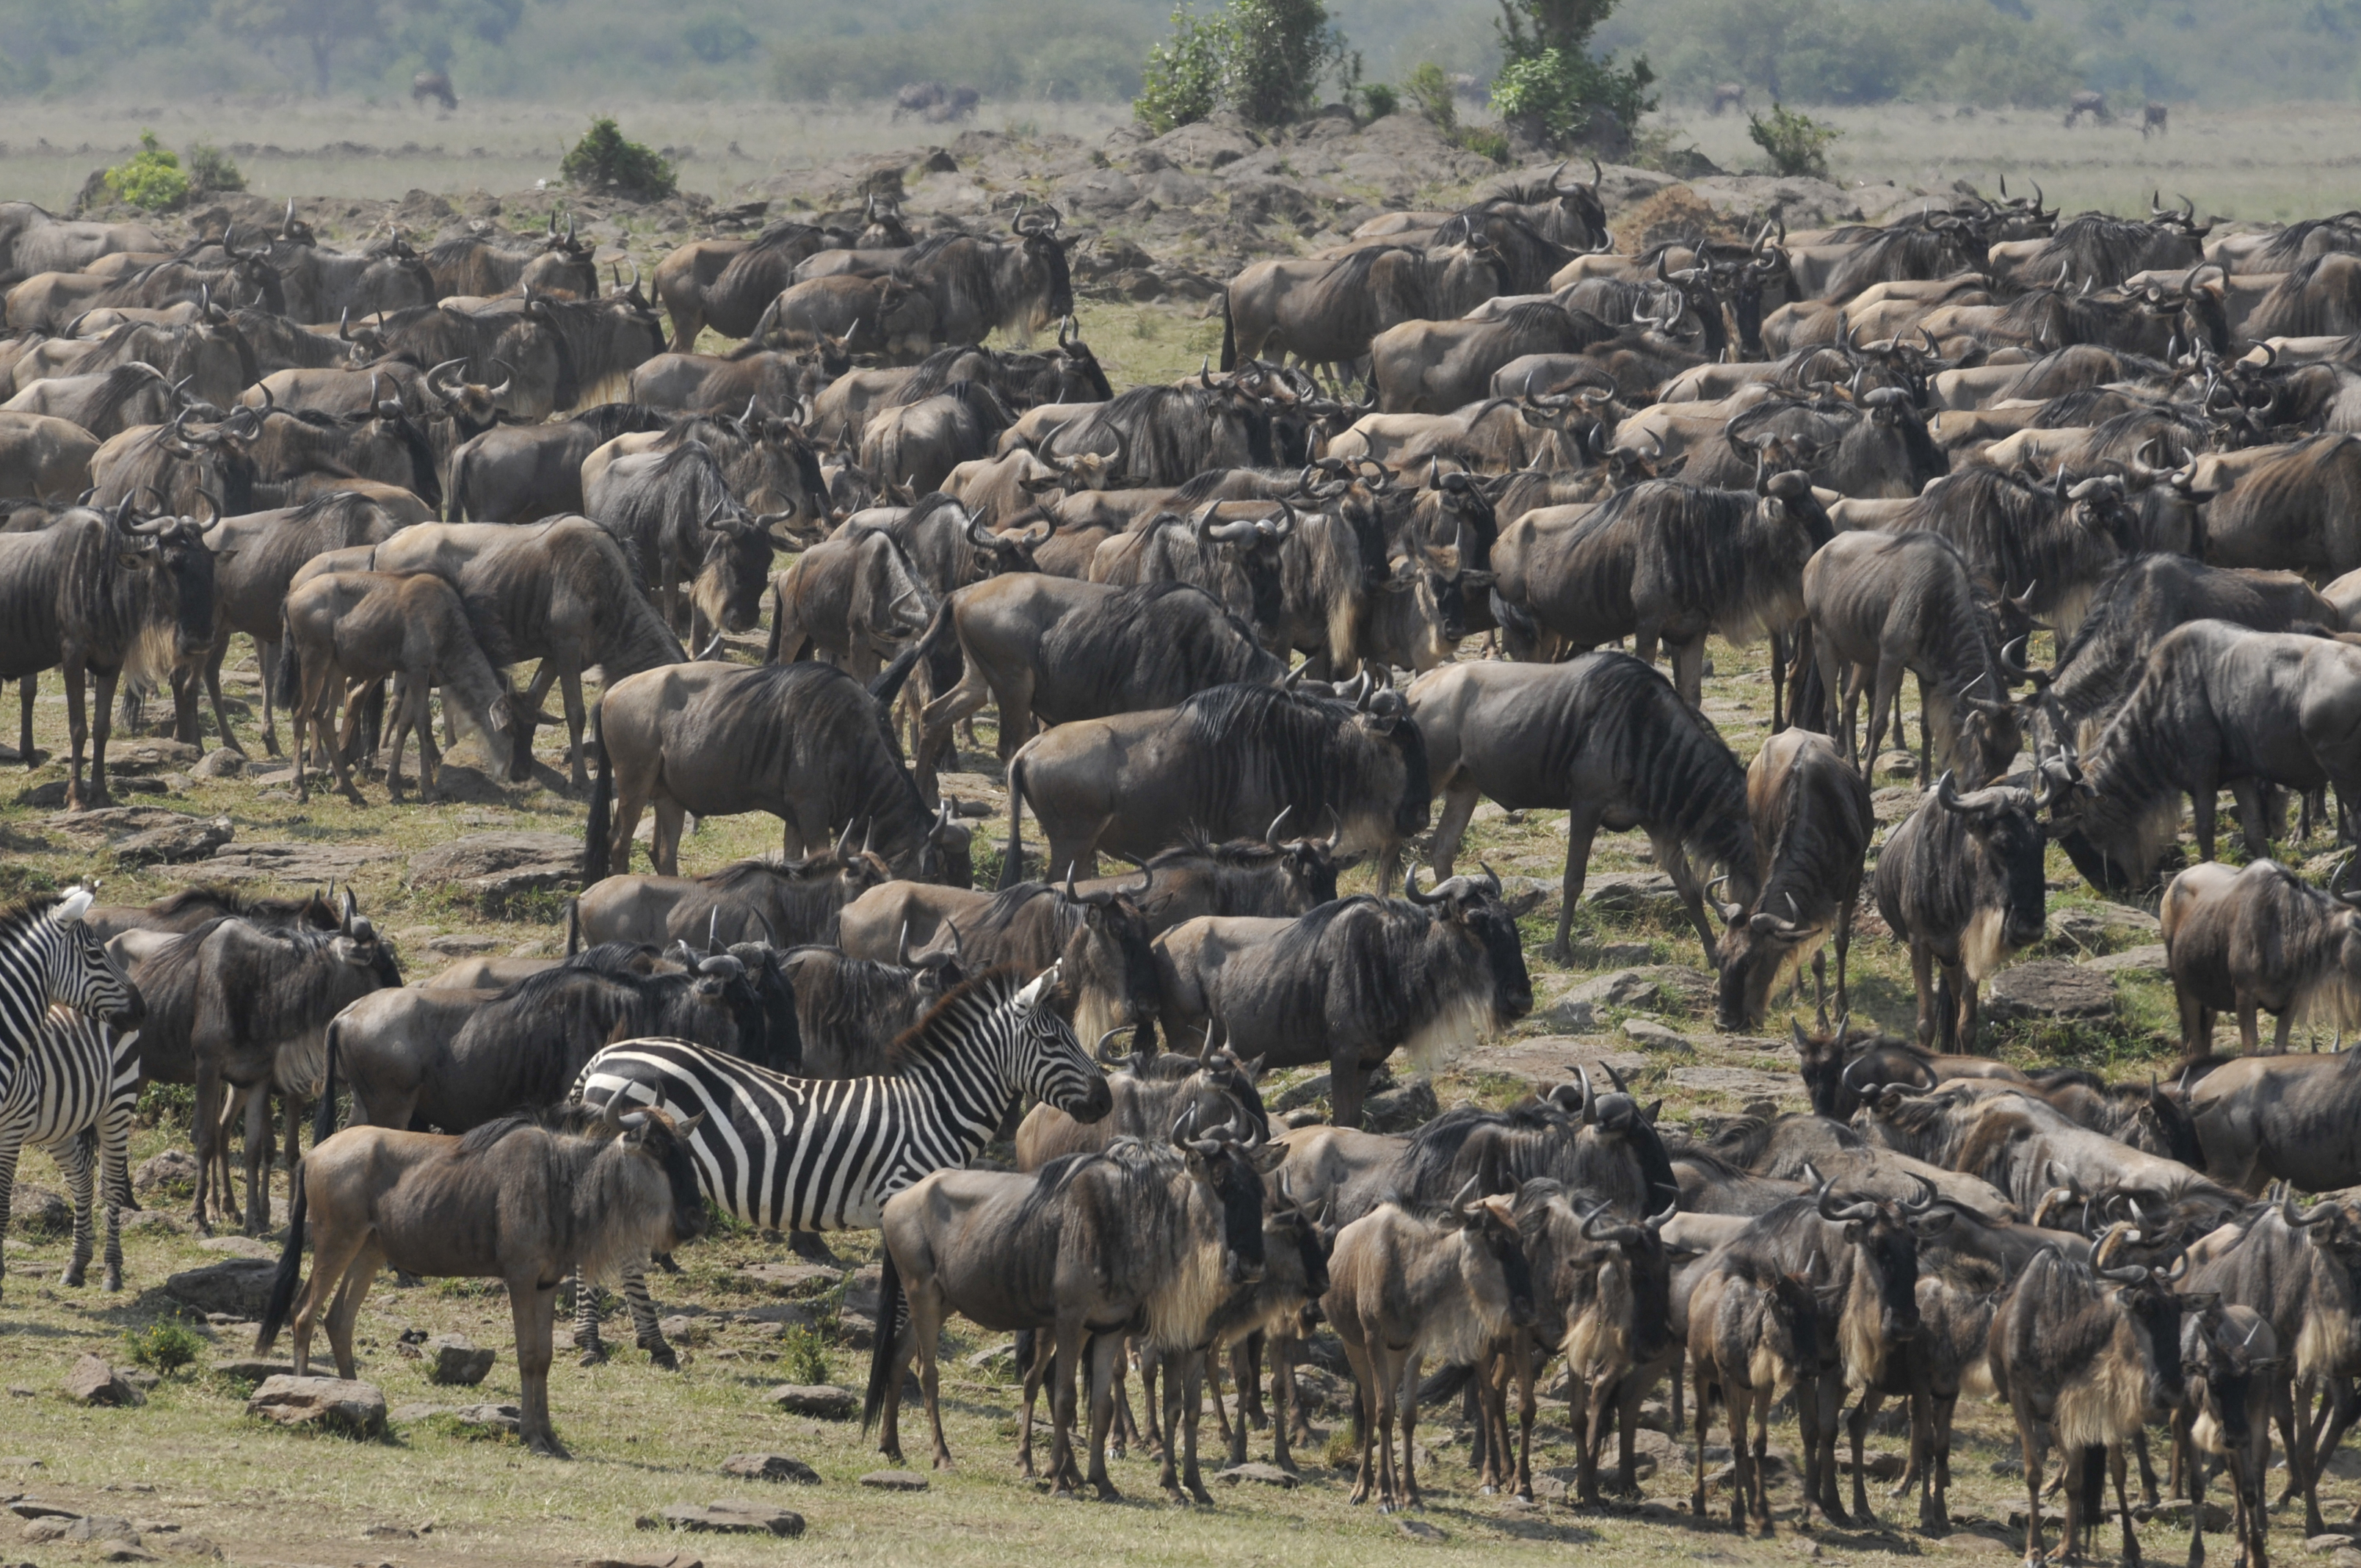 Wildebeest waiting to cross